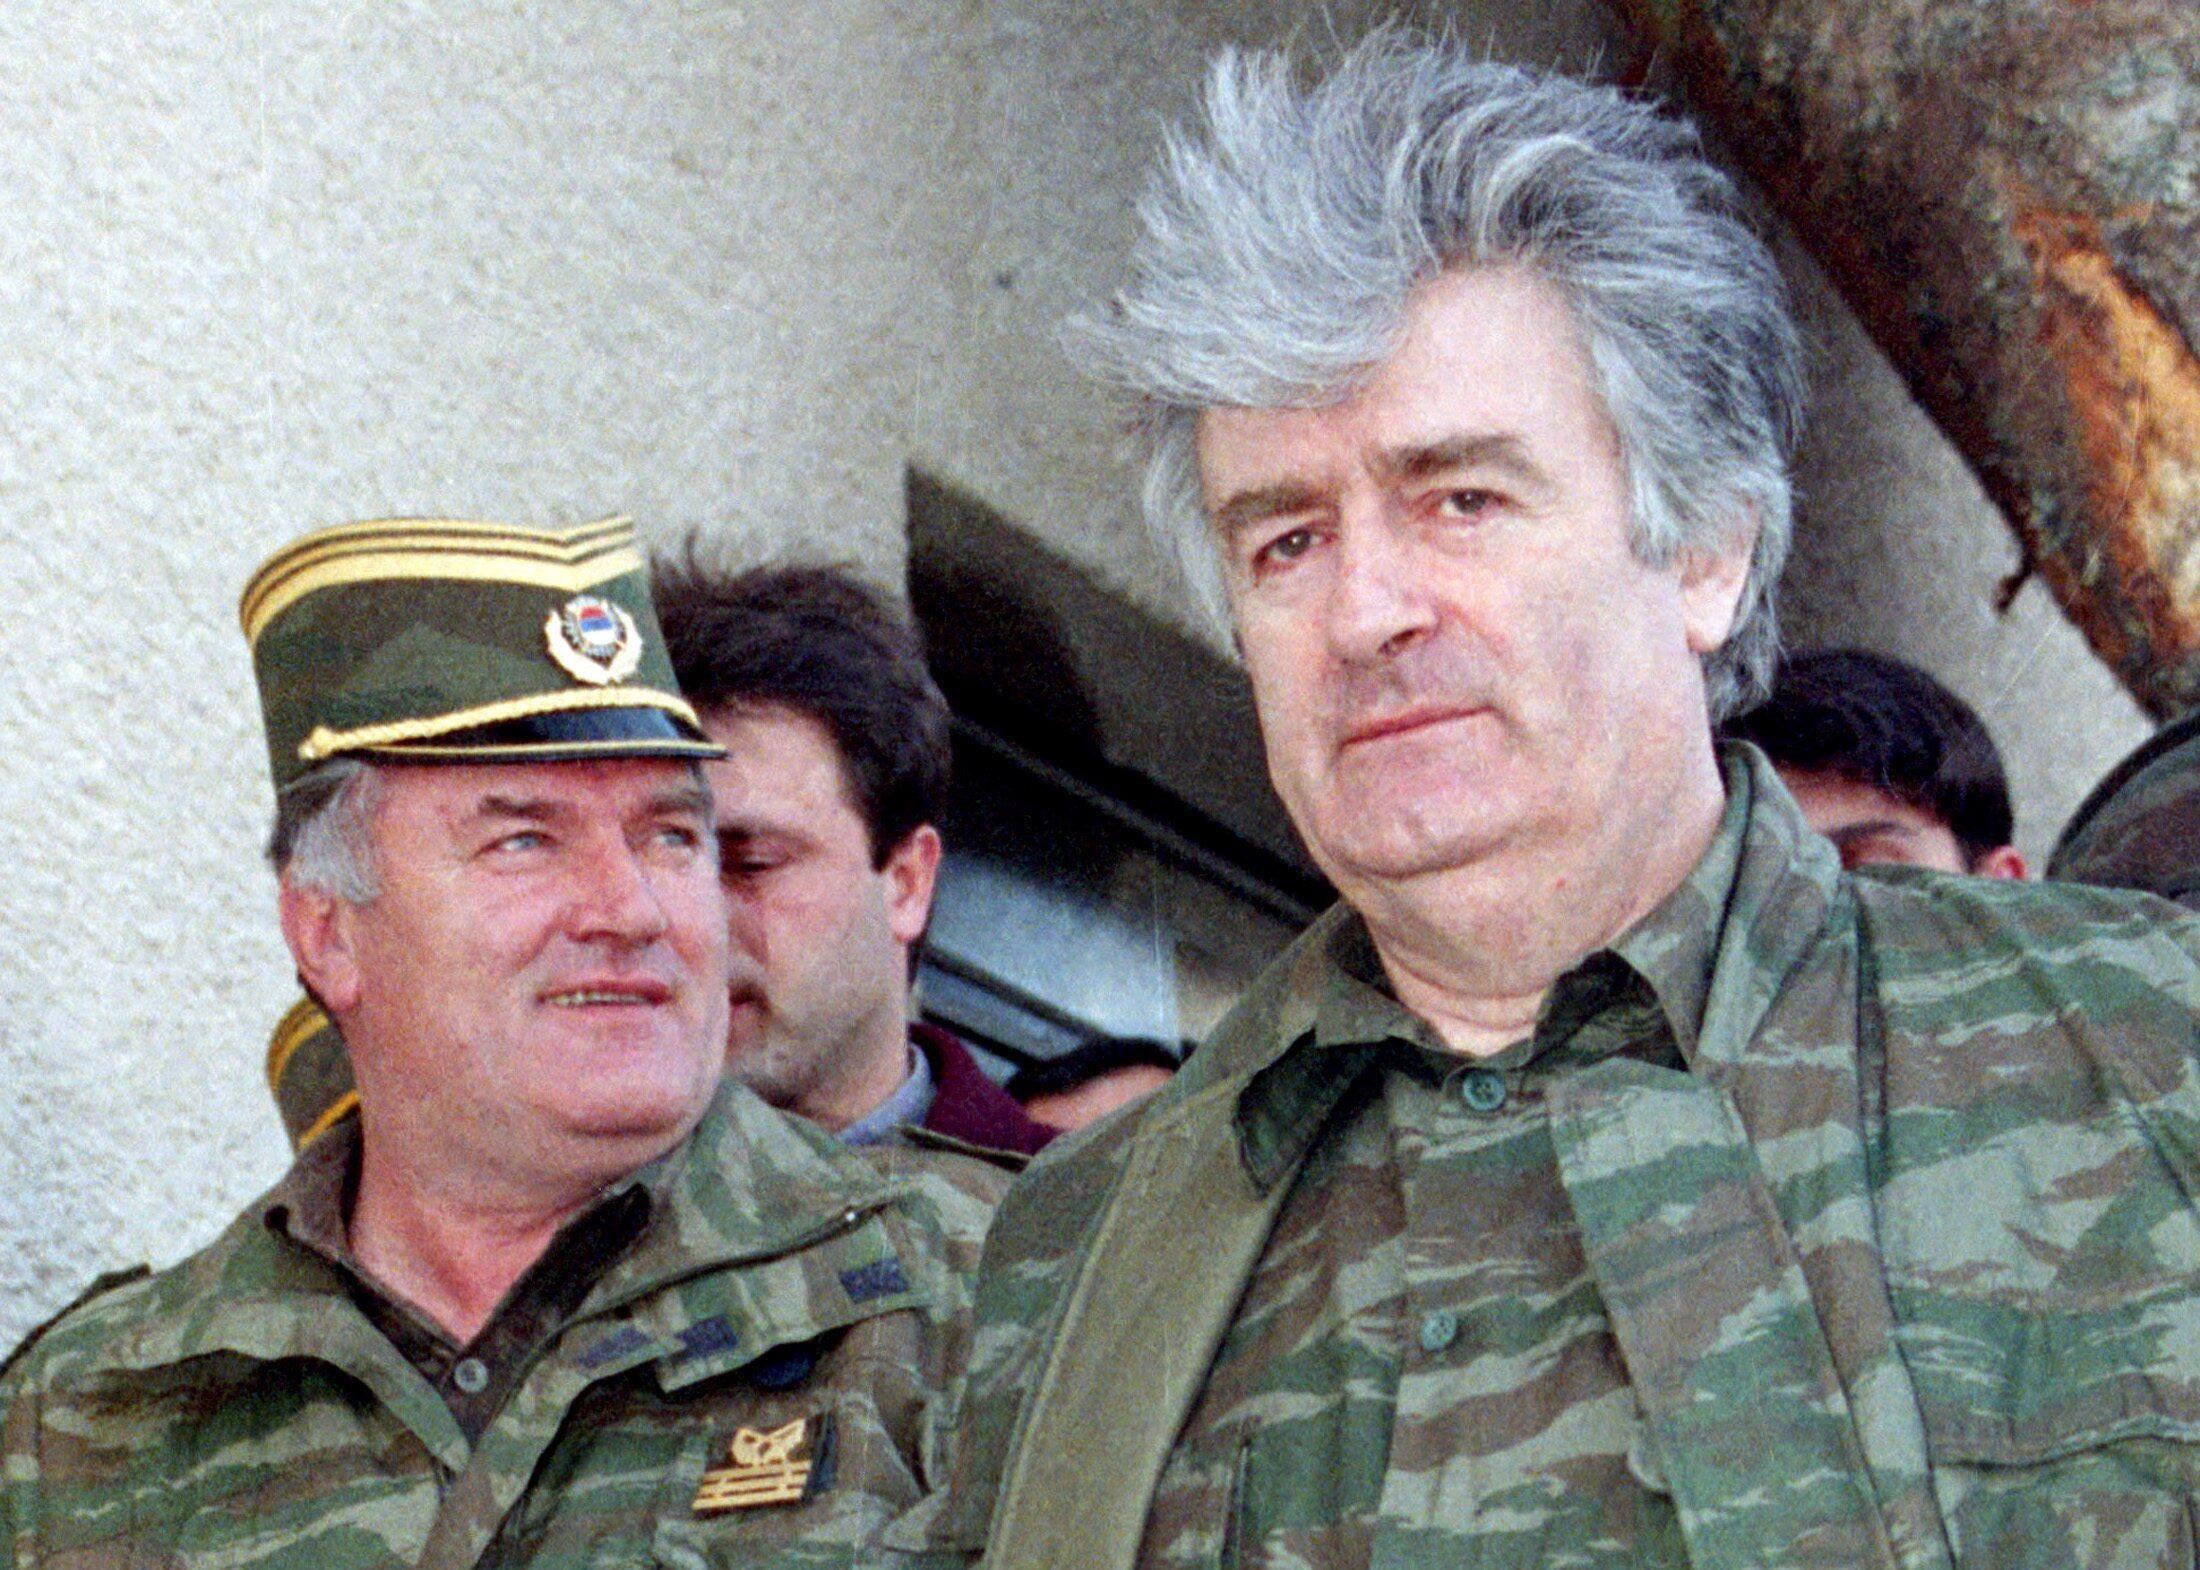 Ratko Mladic (ខាងឆ្វេង) និង Radovan Karadzic រូបថត ក្នុងឆ្នាំ១៩៩៥